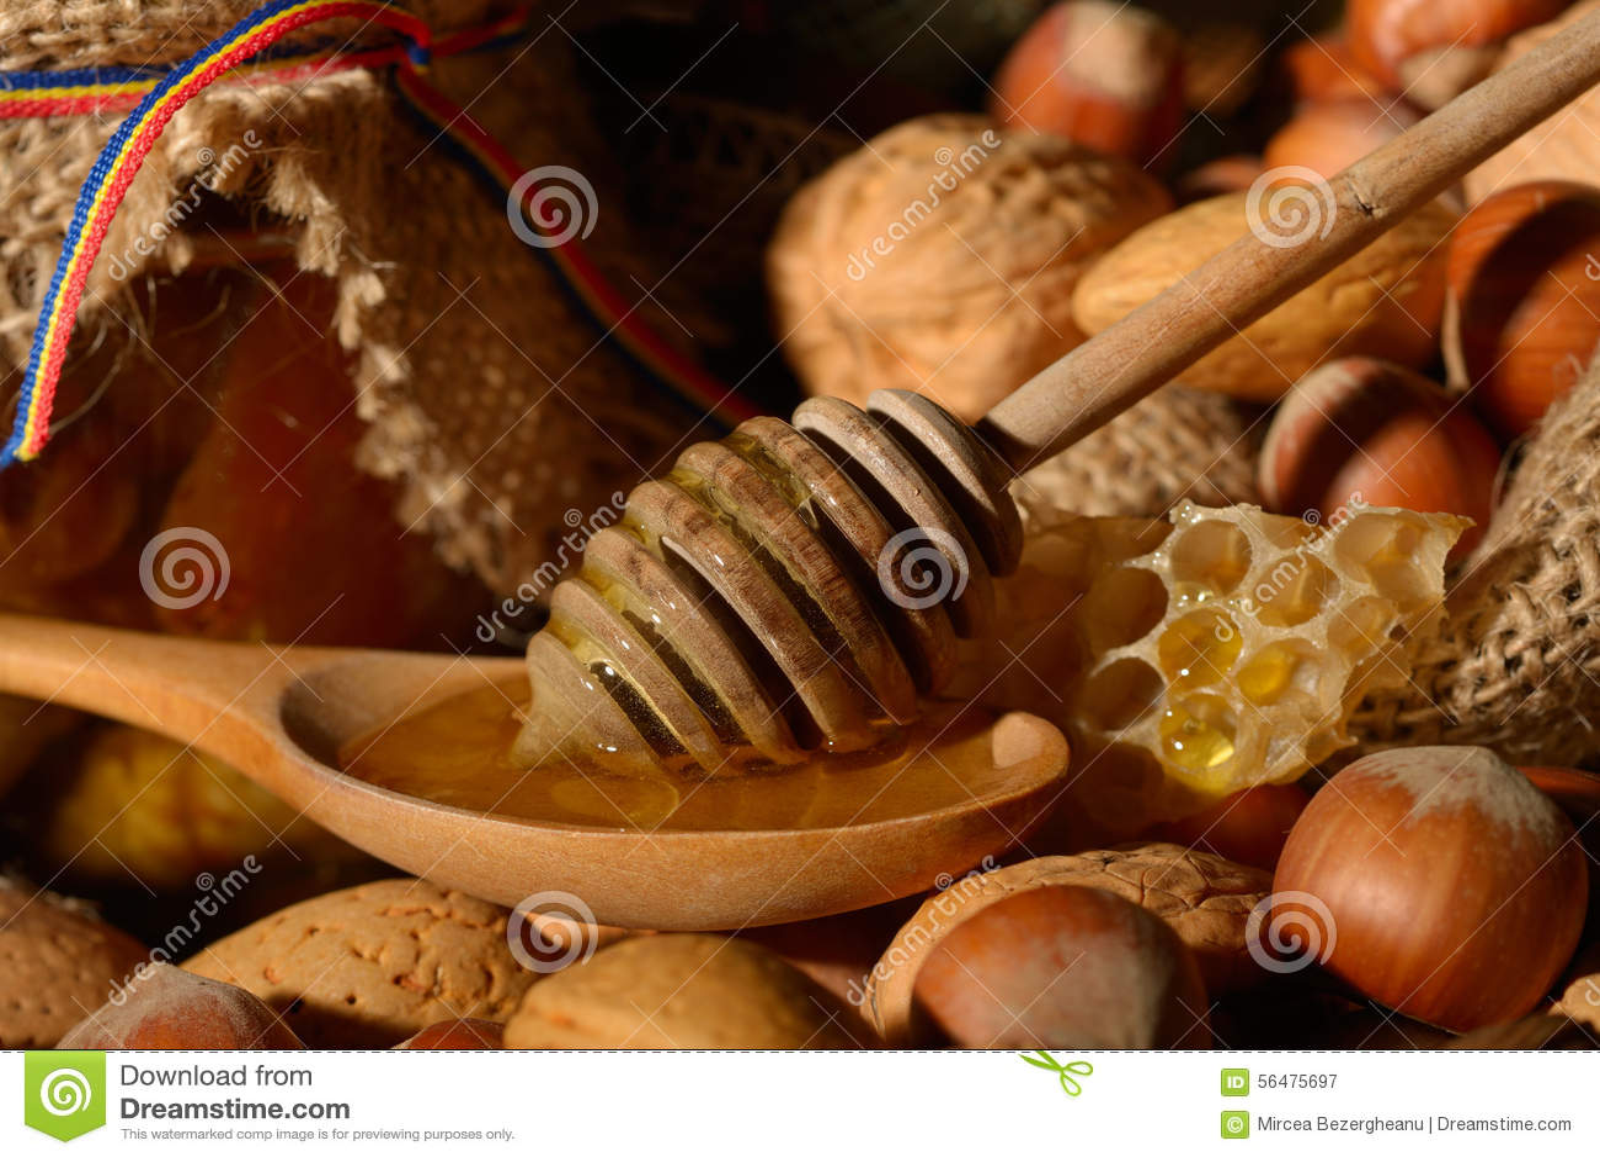 Miel d or et fruits écossés